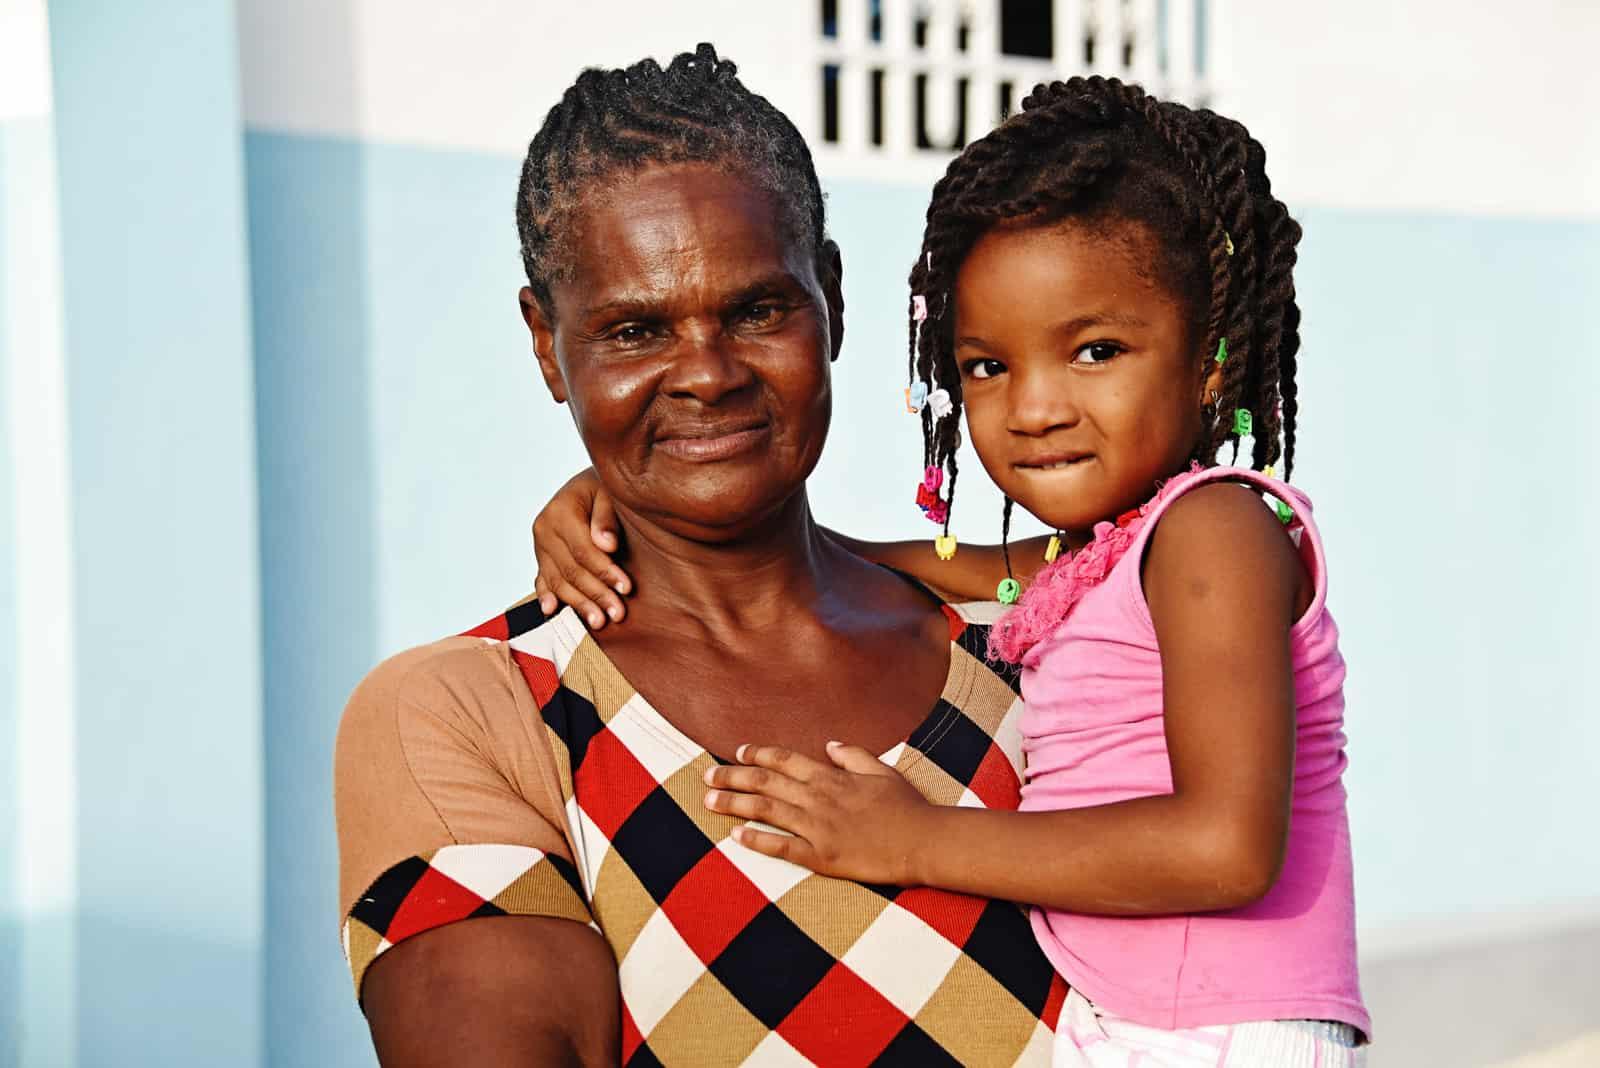 One Year After the Devastating Hurricane Matthew in Haiti